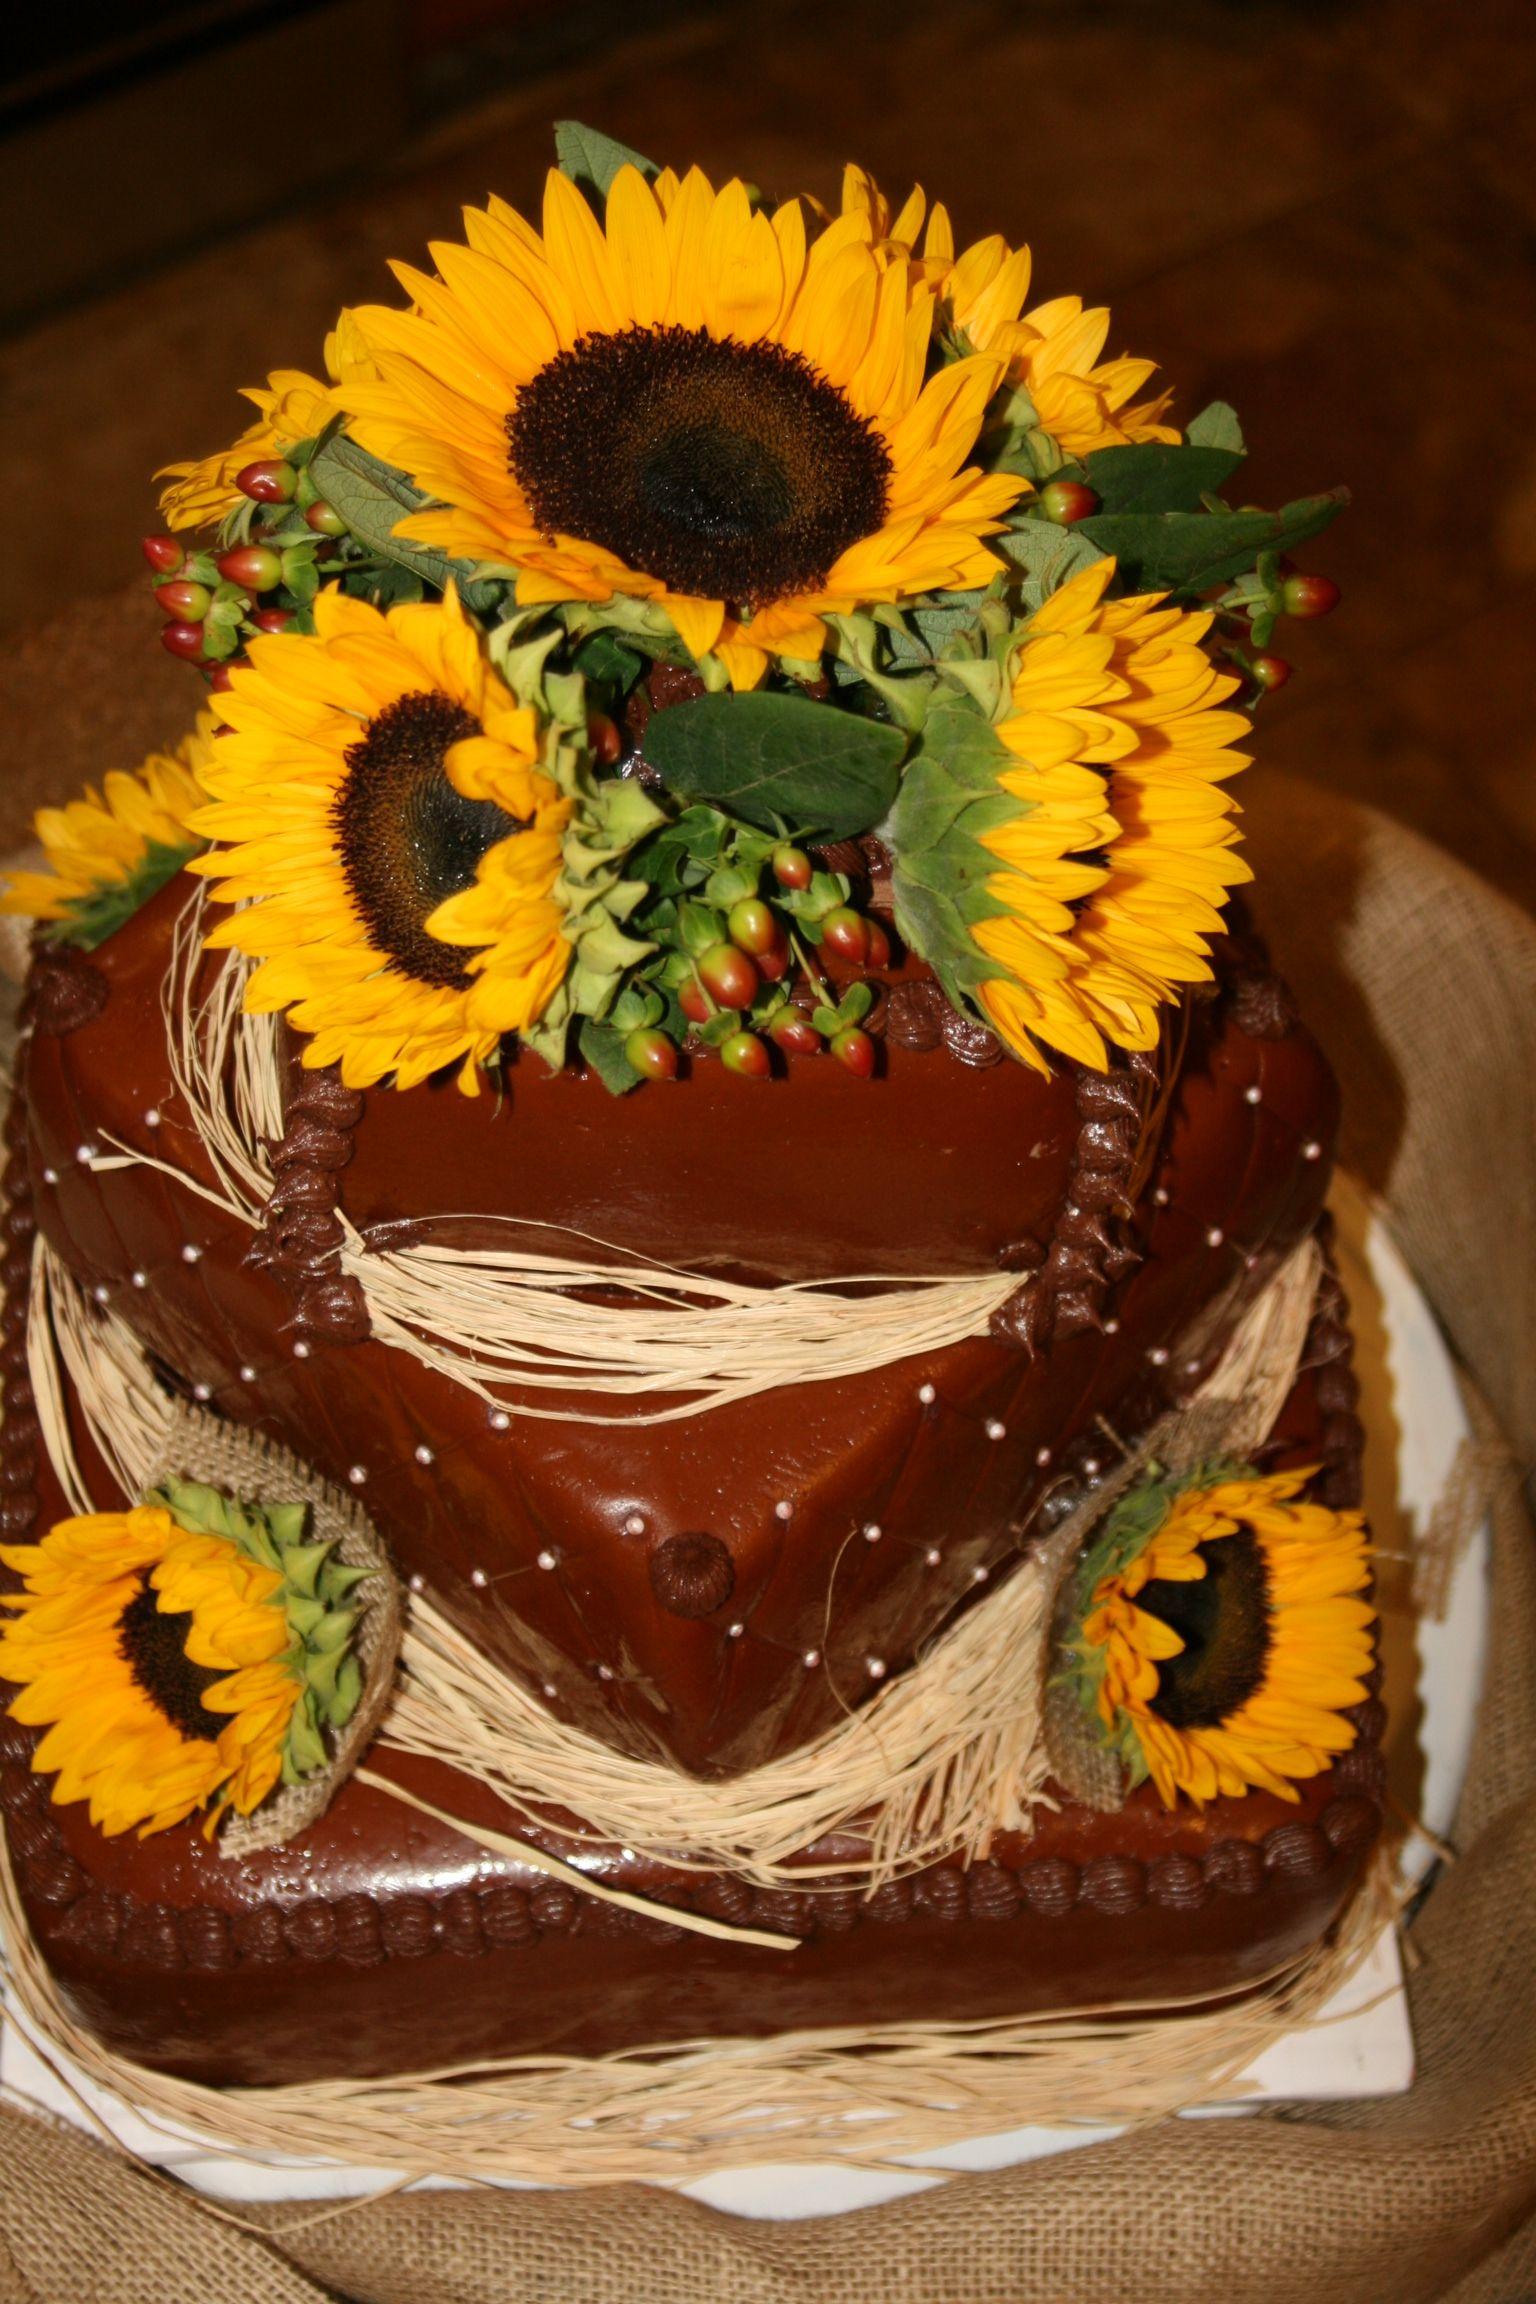 Chocolate Fondant Sunflower Wedding Cake